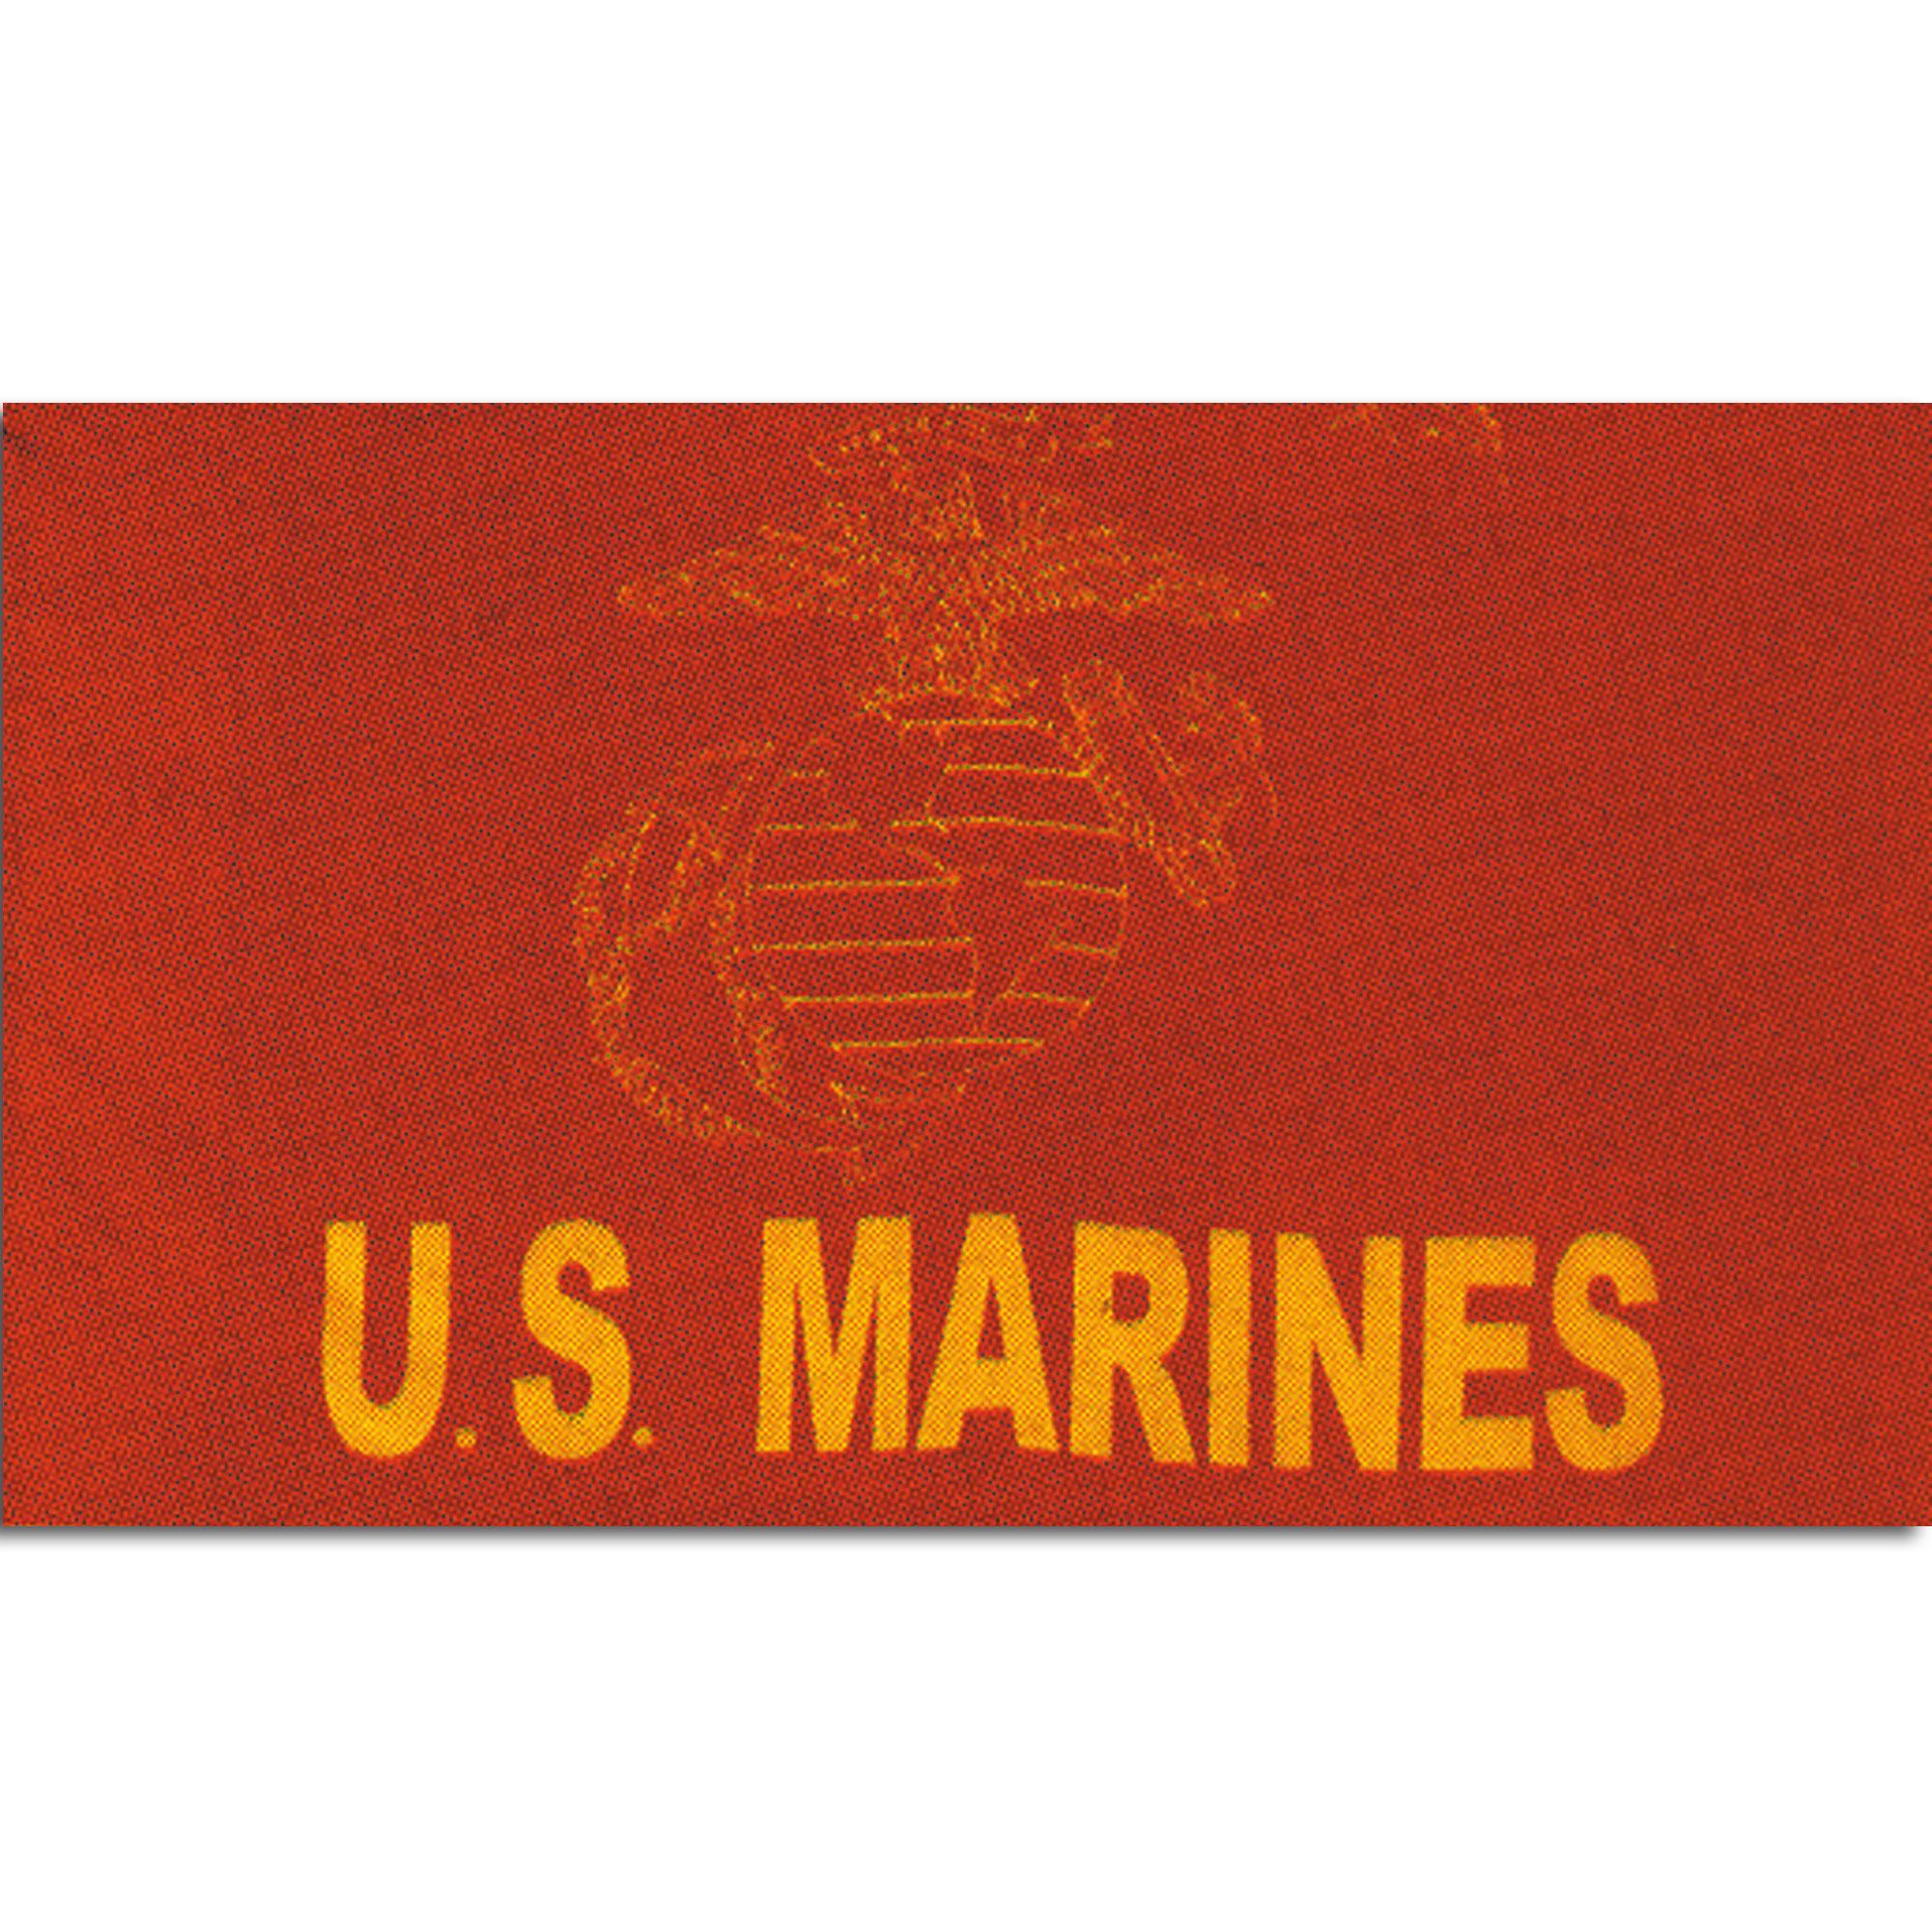 Flagge US Marines ROT